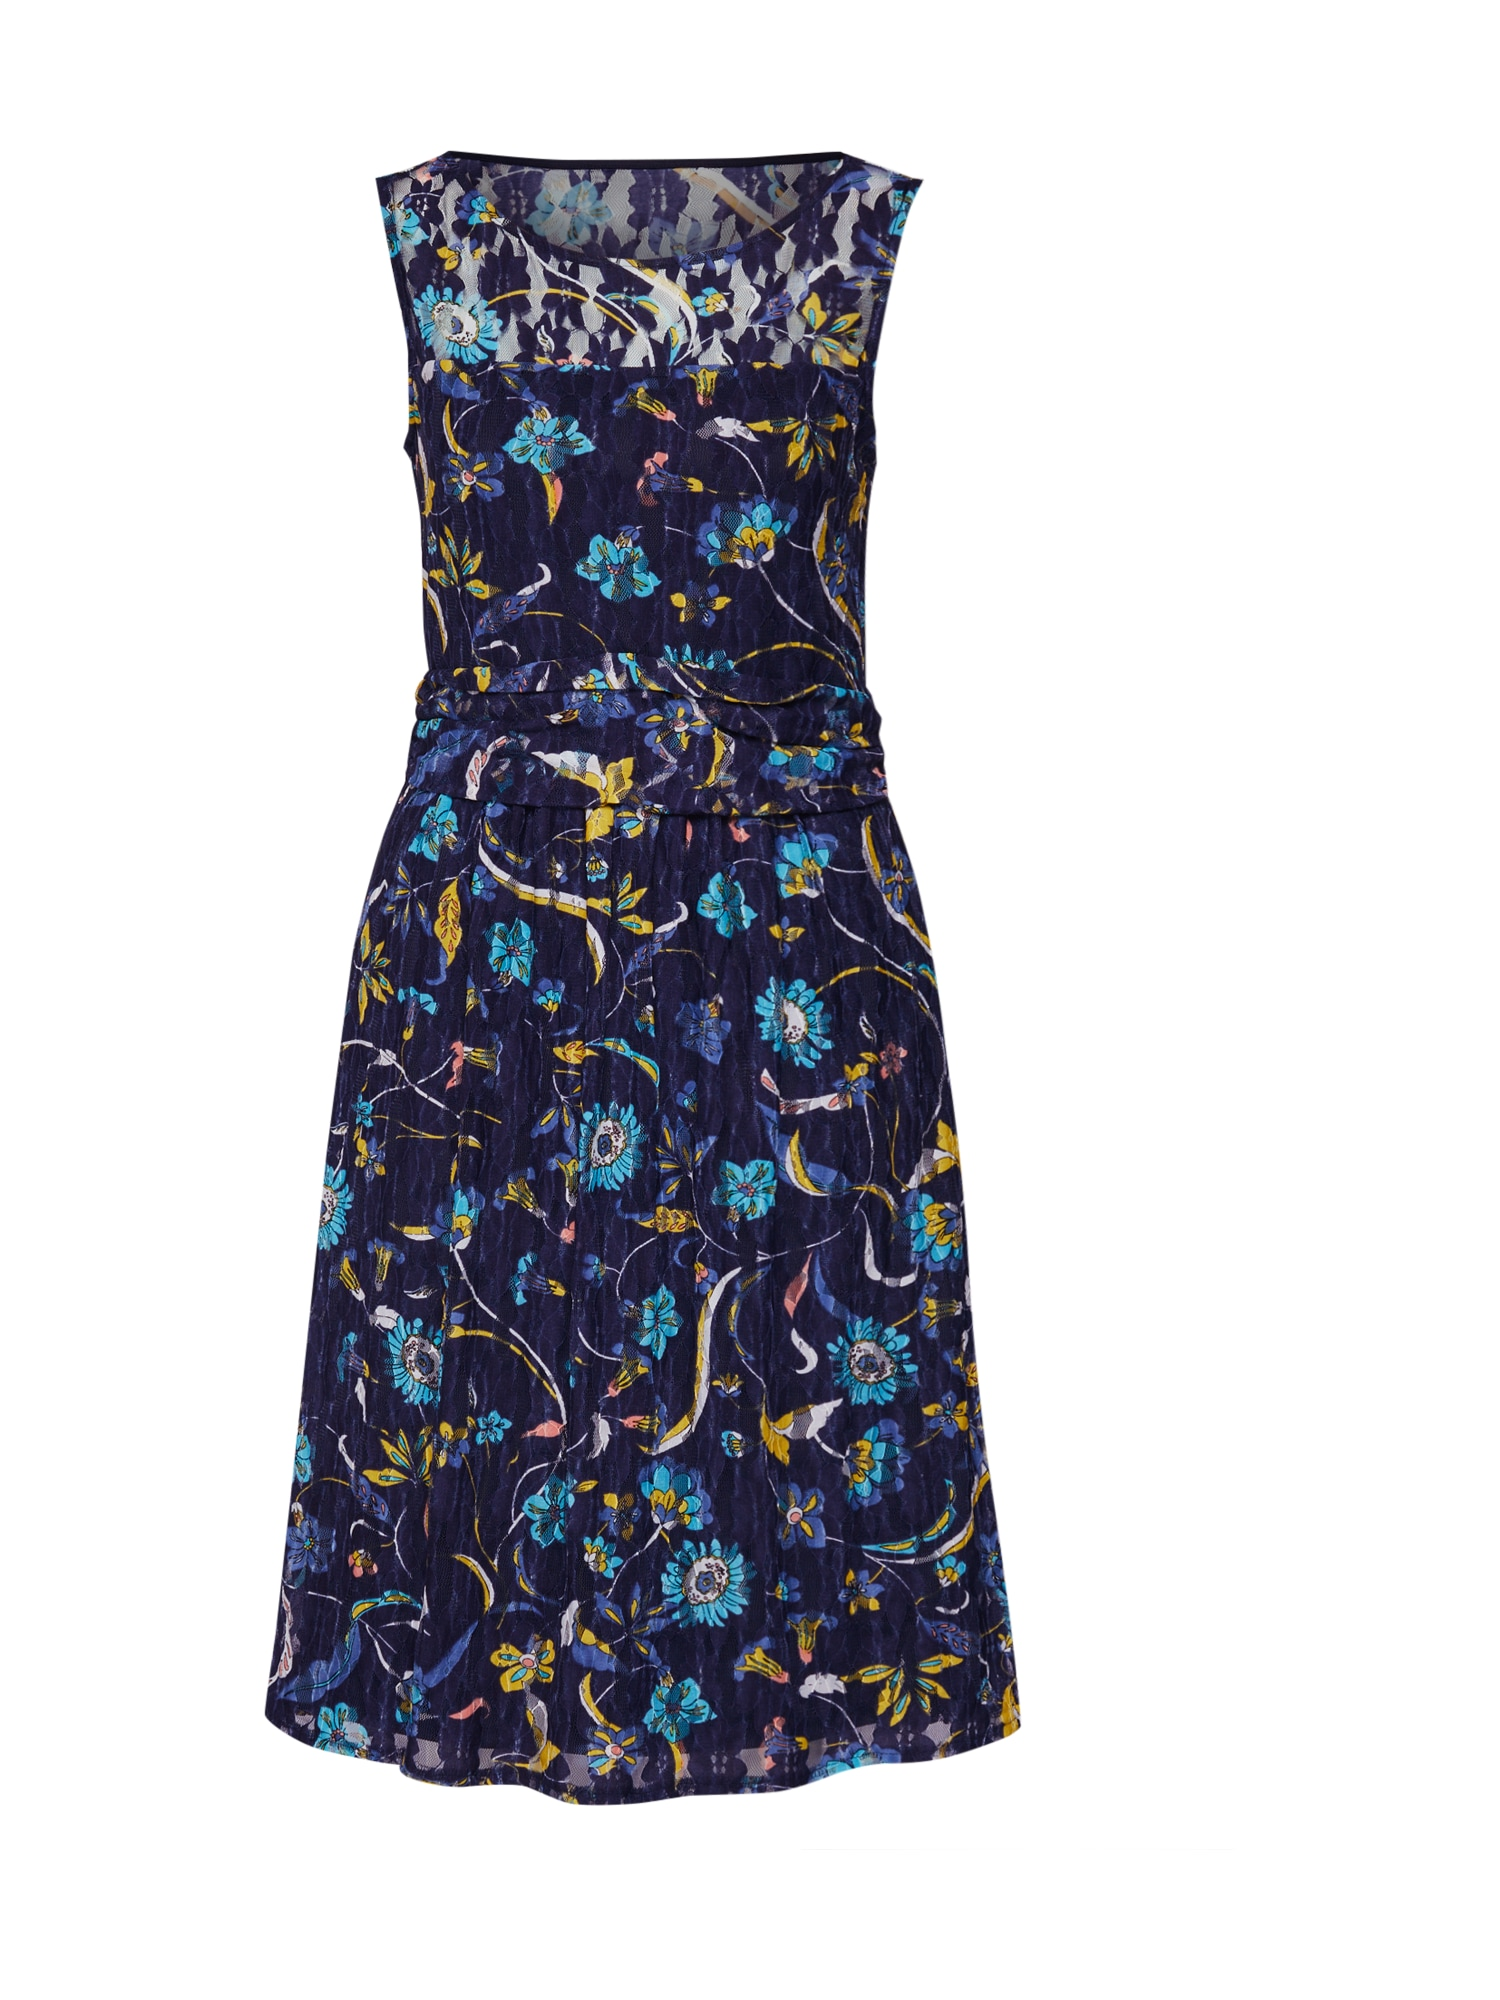 Esprit Collection Sukienka koktajlowa  ciemny niebieski / mieszane kolory